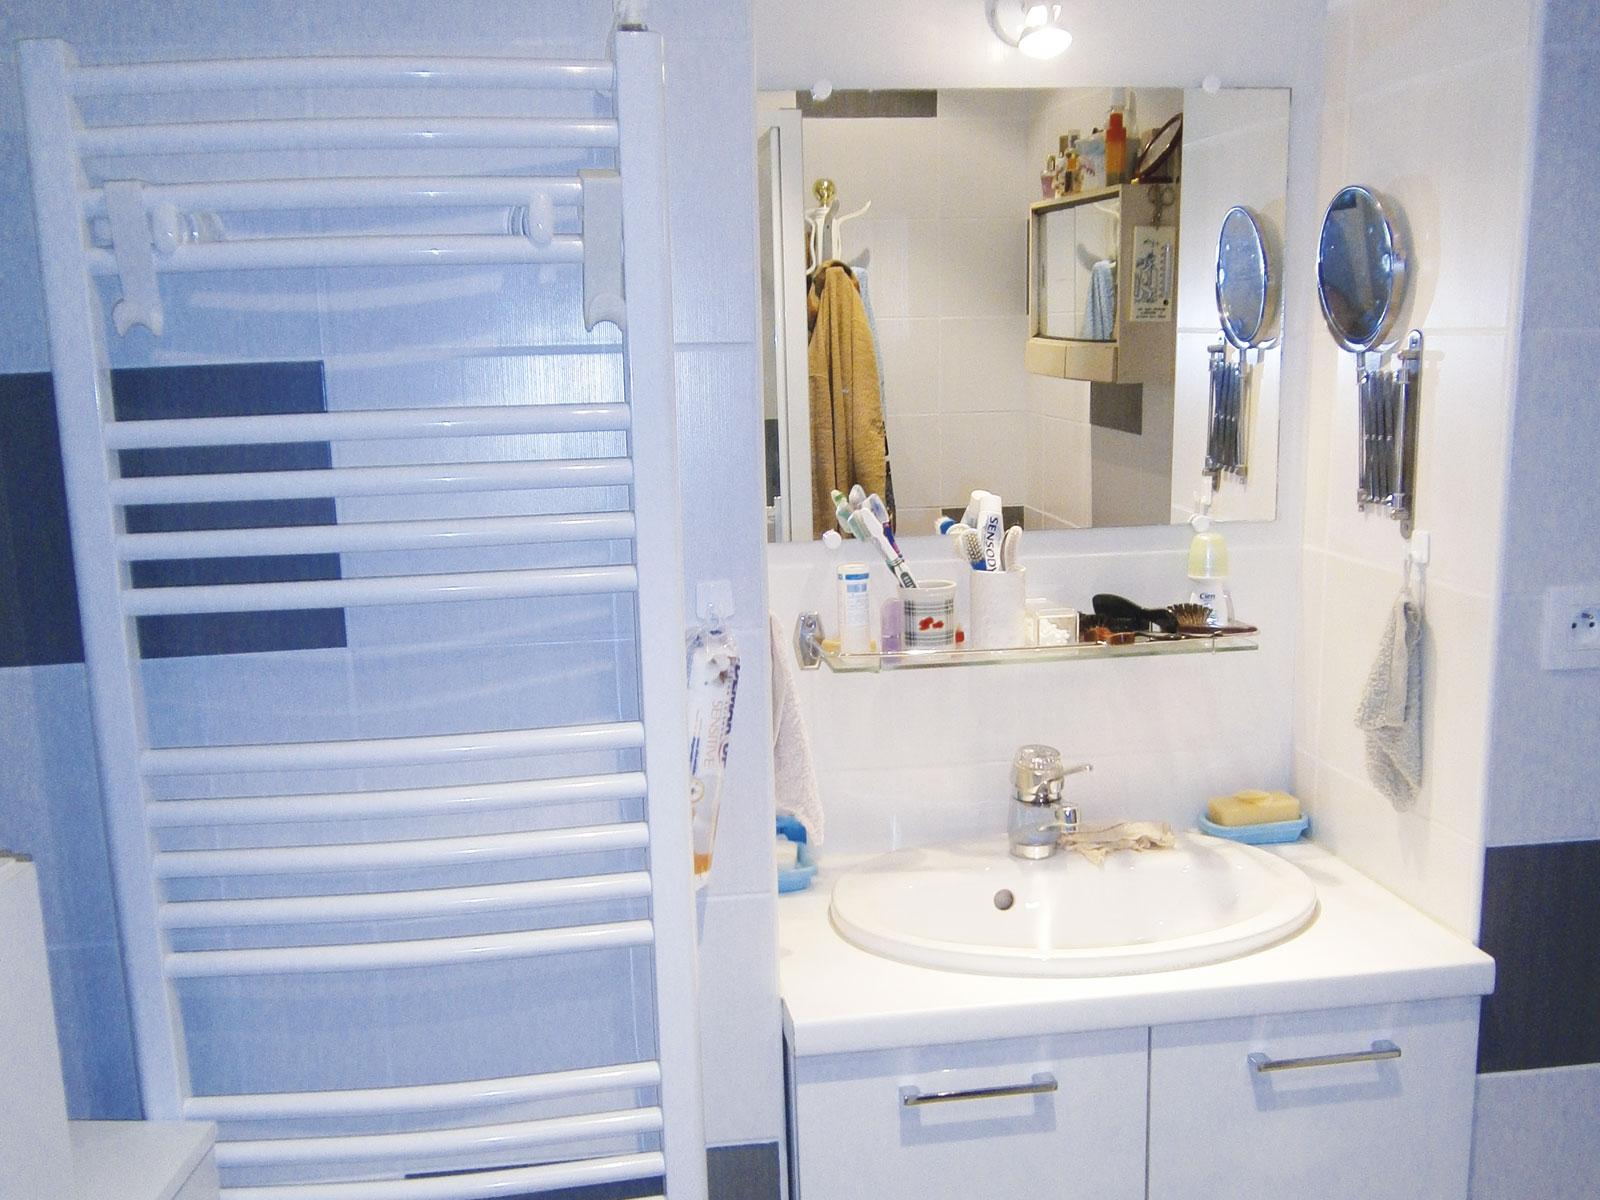 univers carrelage albi foot en salle toulouse fresh ralise deux terrains de foot indoor albi. Black Bedroom Furniture Sets. Home Design Ideas